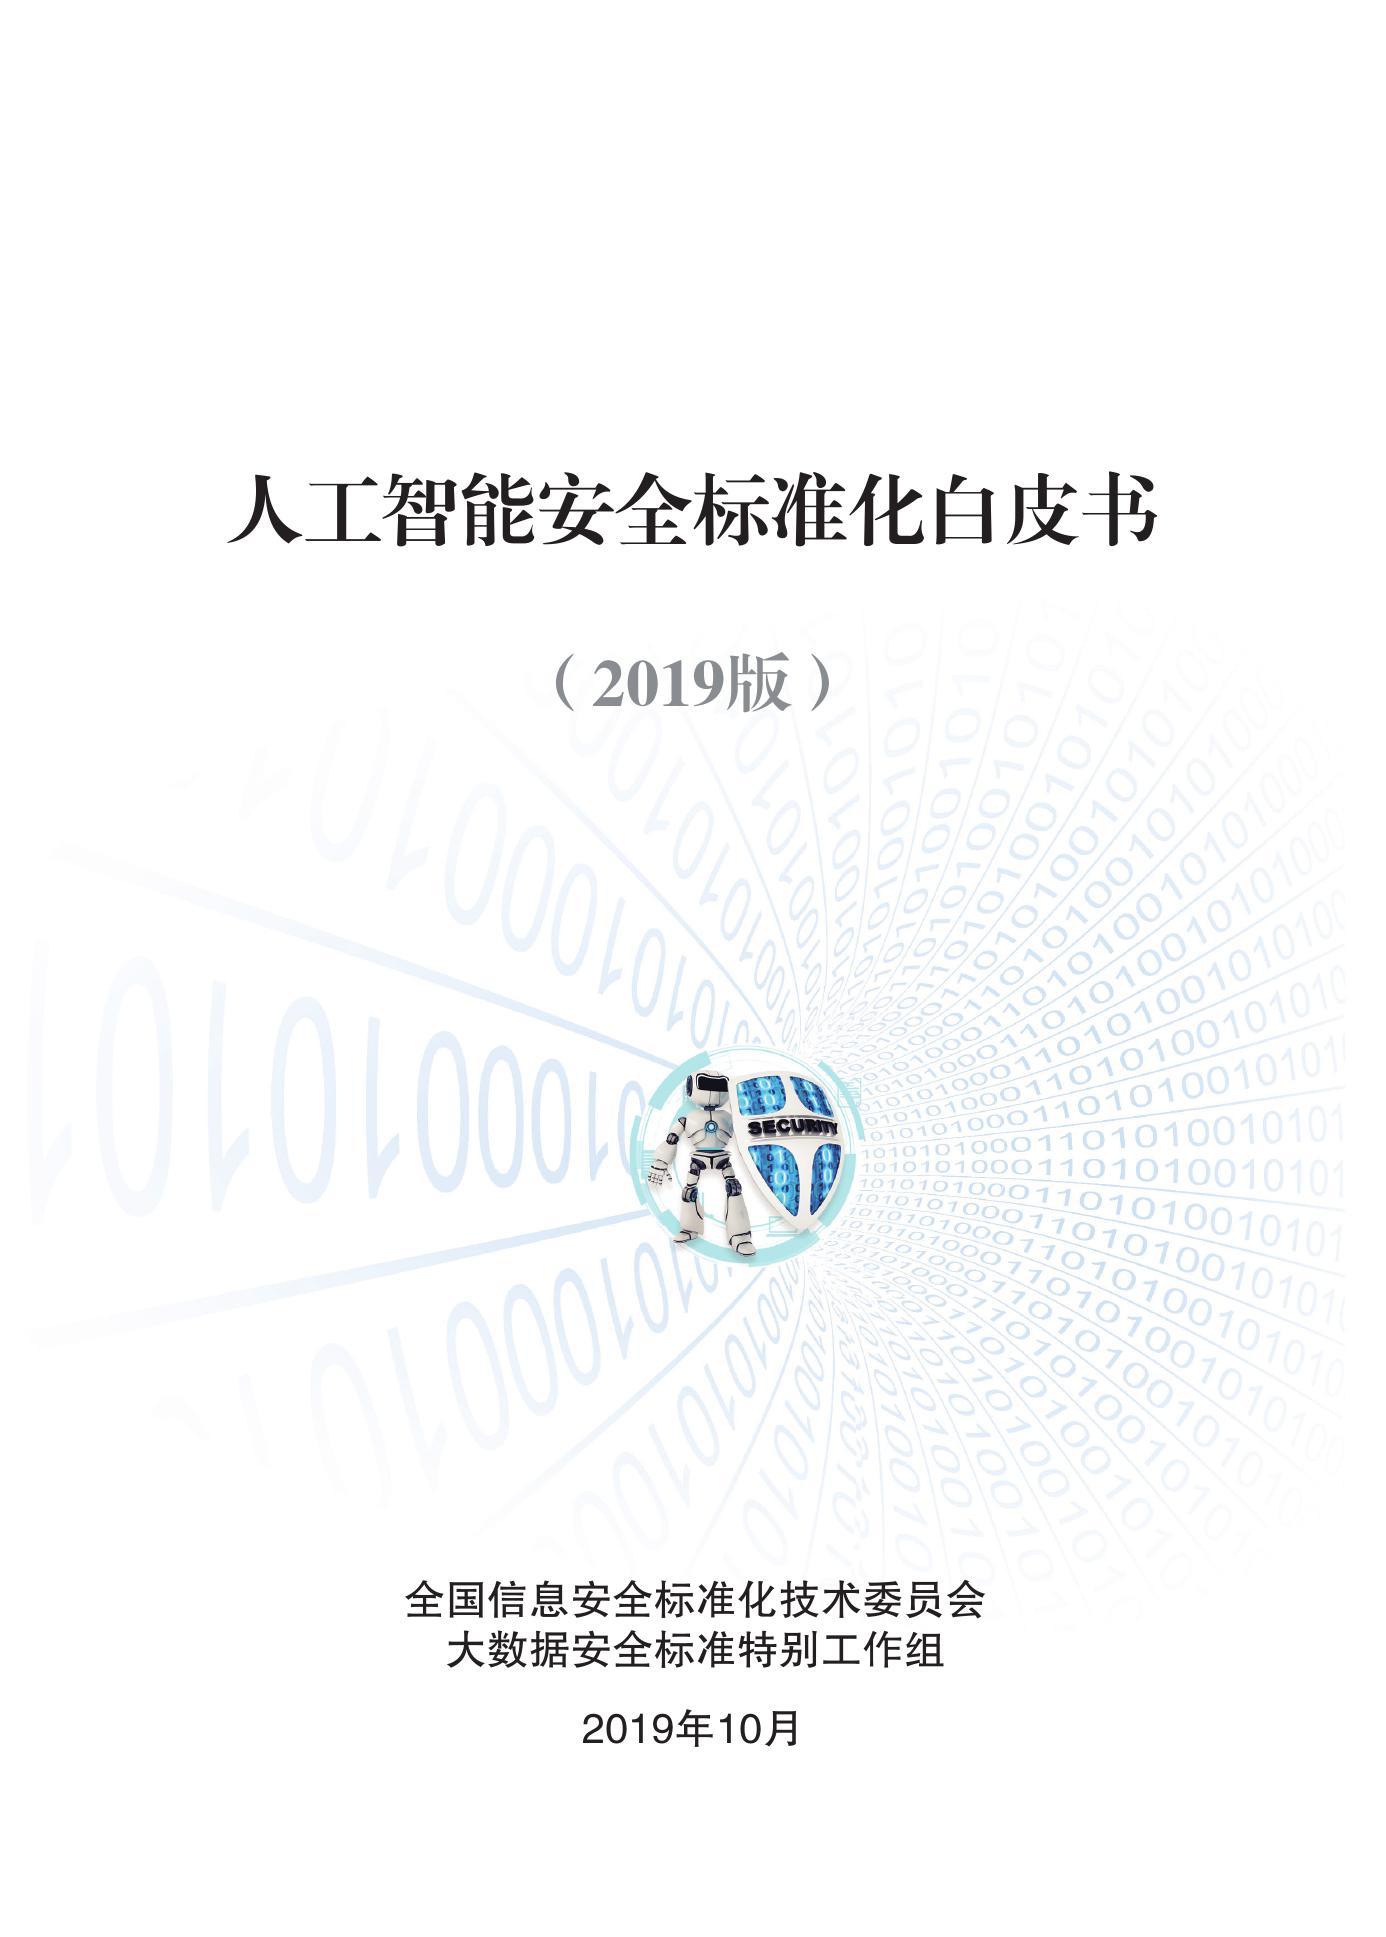 CESI:2019年人工智能安全标准化白皮书(附下载)